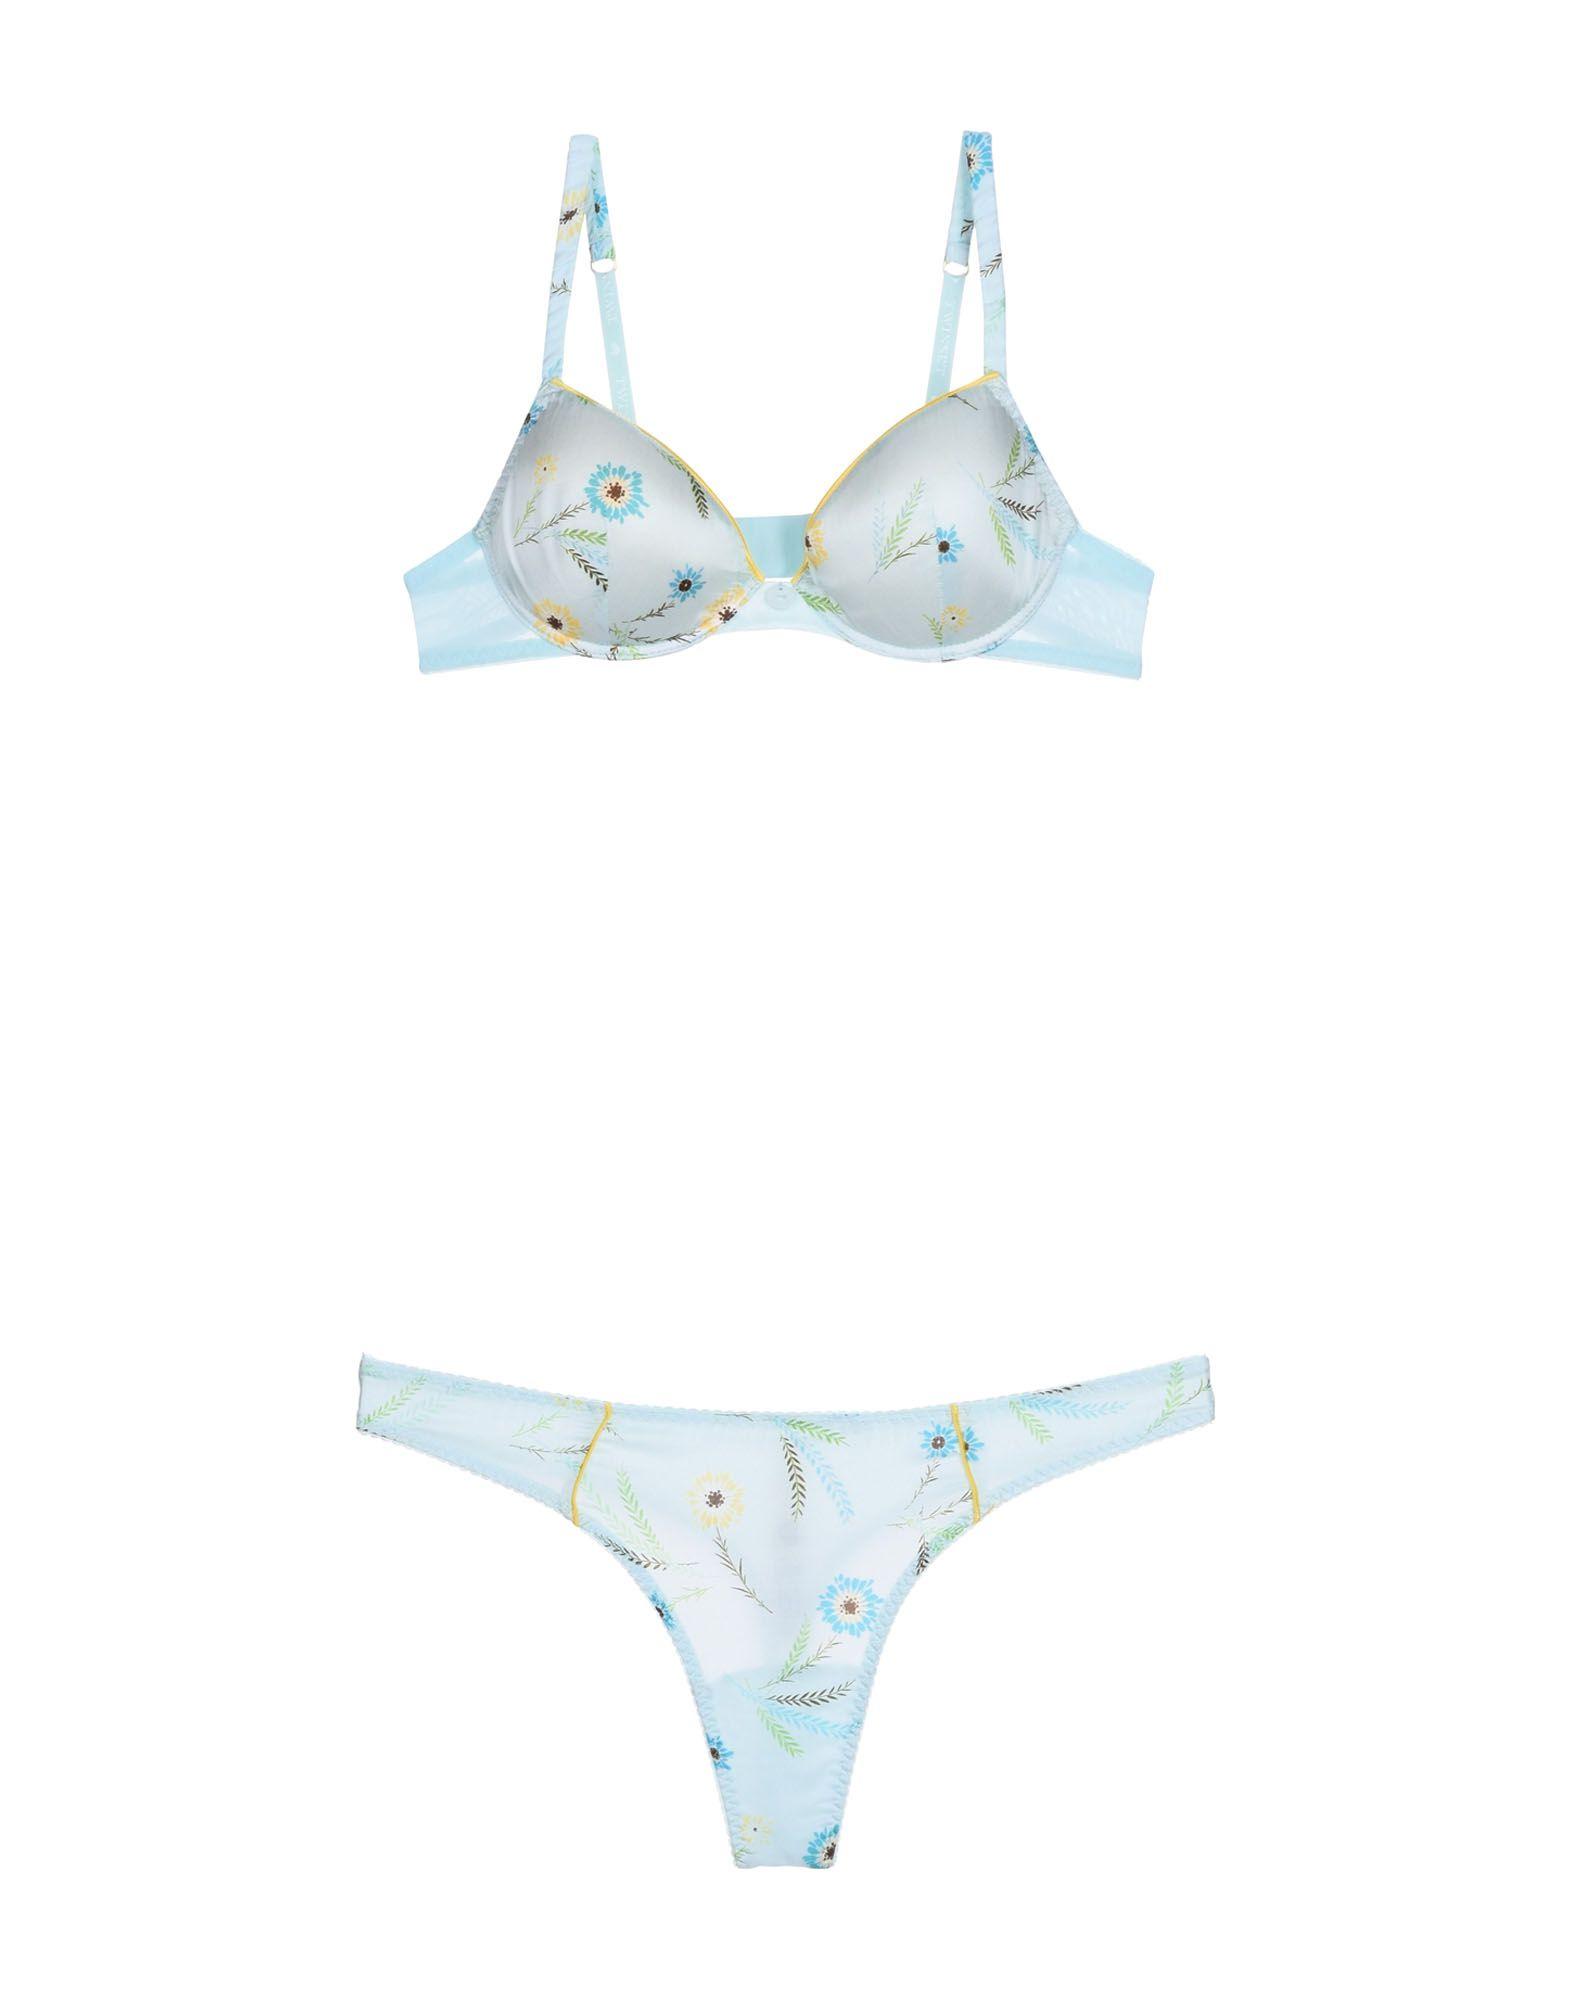 TWIN-SET Simona Barbieri Комплект белья комплекты белья linse комплект белья